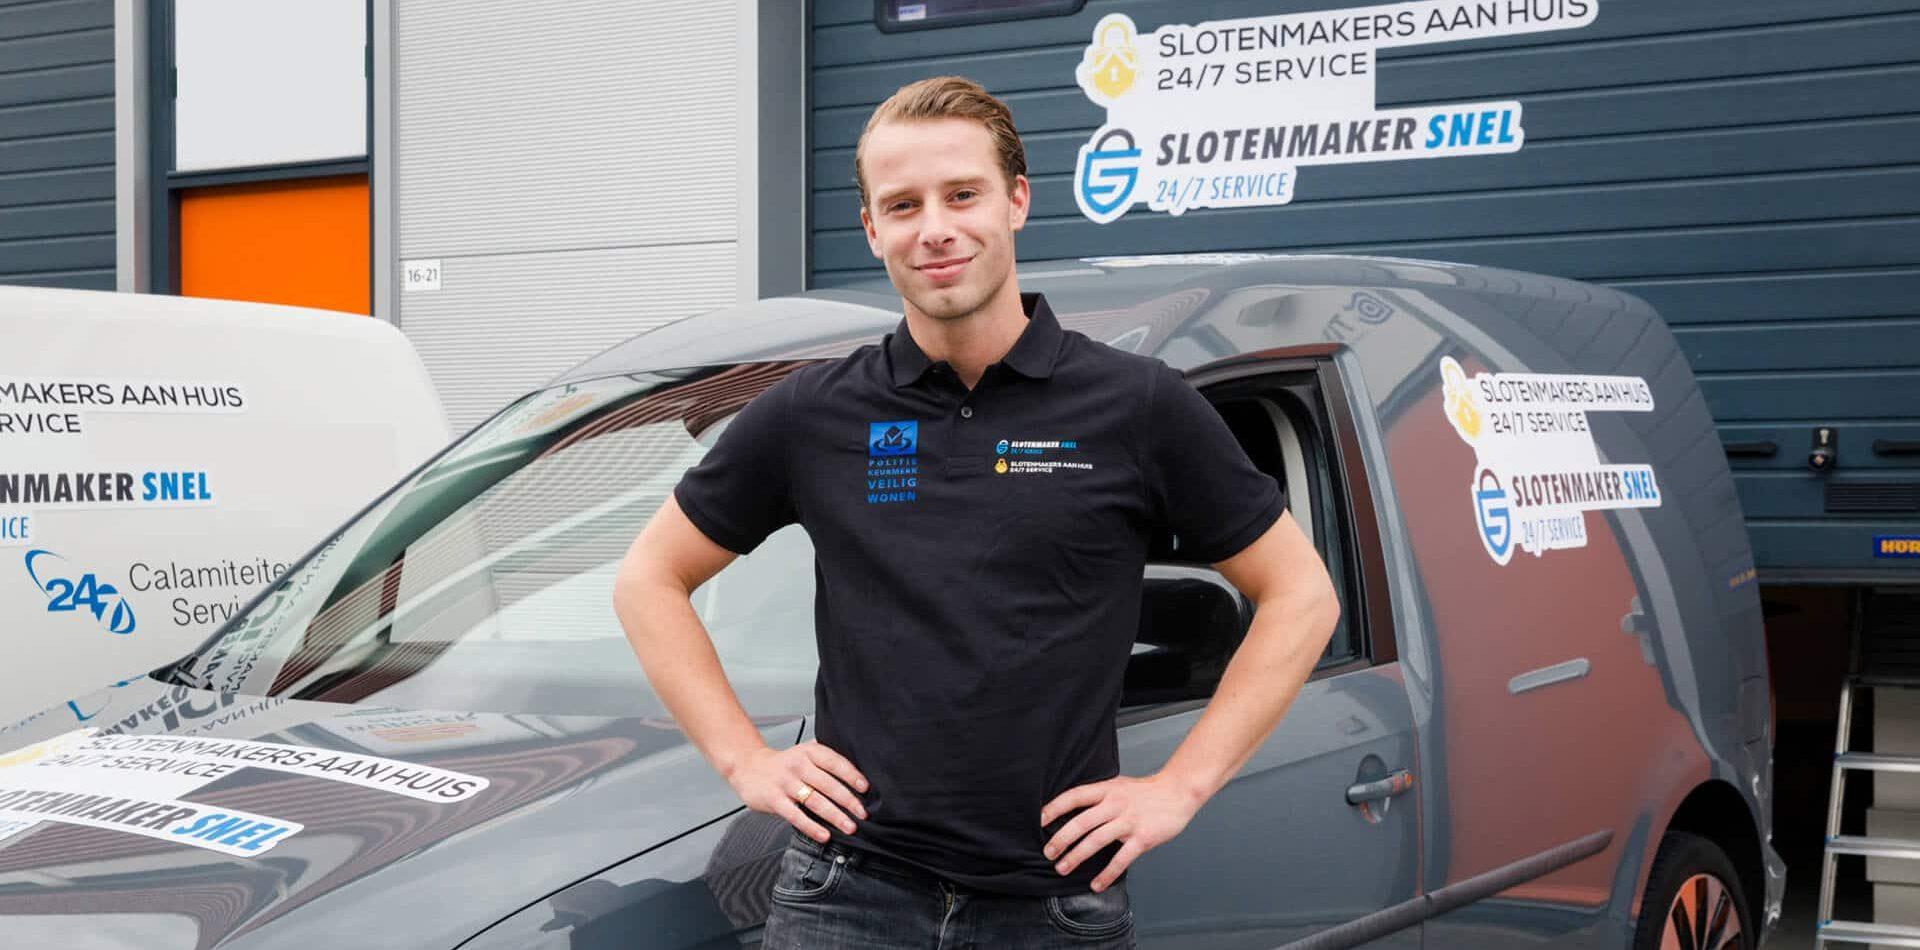 Slotenmaker Oosterbeek